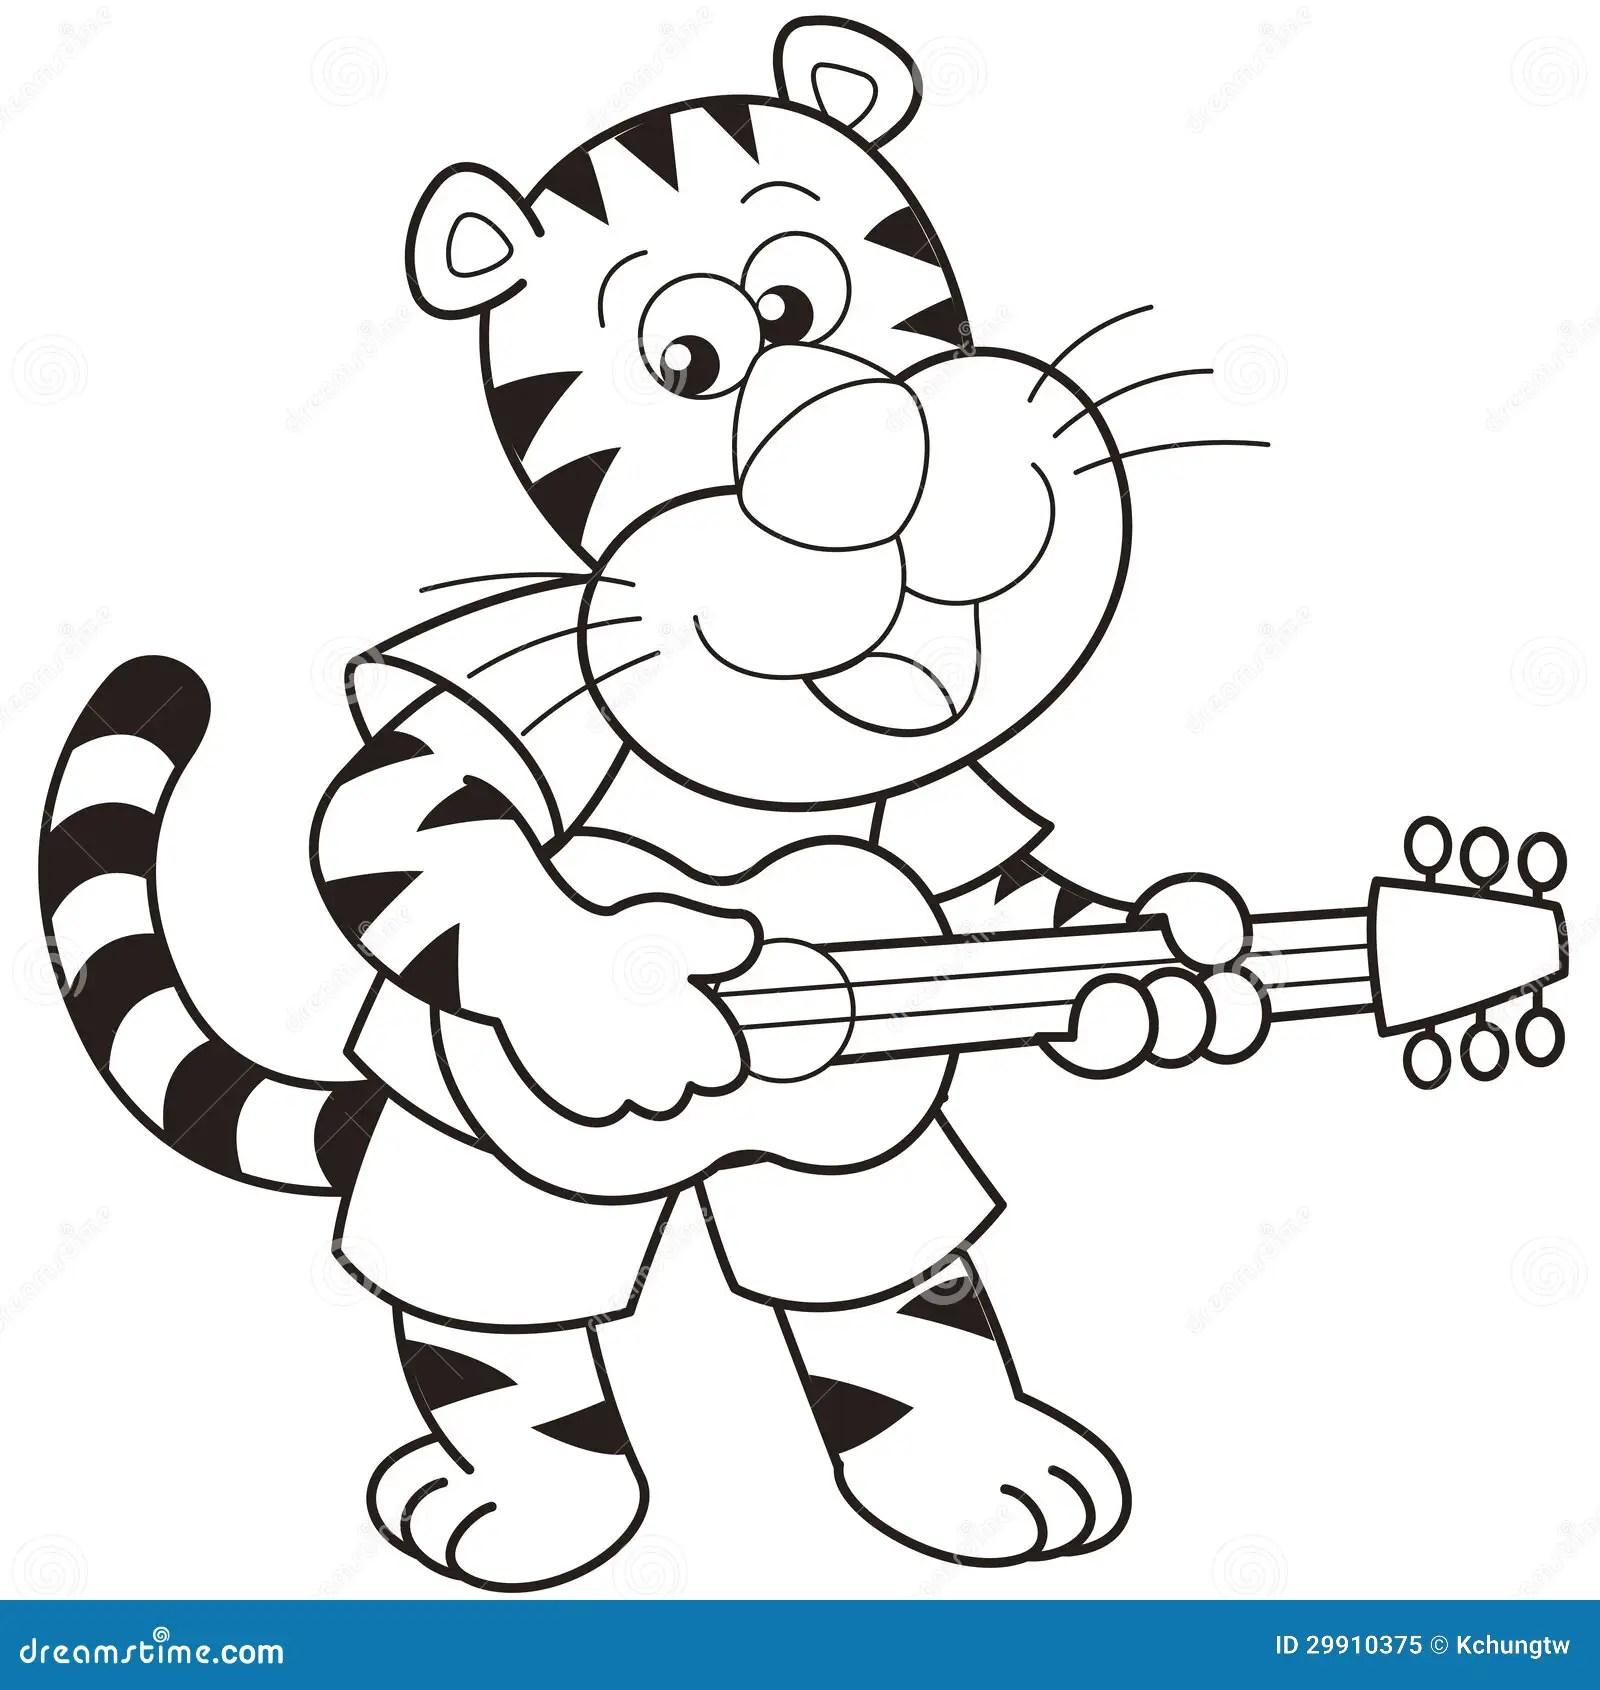 Cartoon Tiger Playing A Guitar Royalty Free Stock Photo